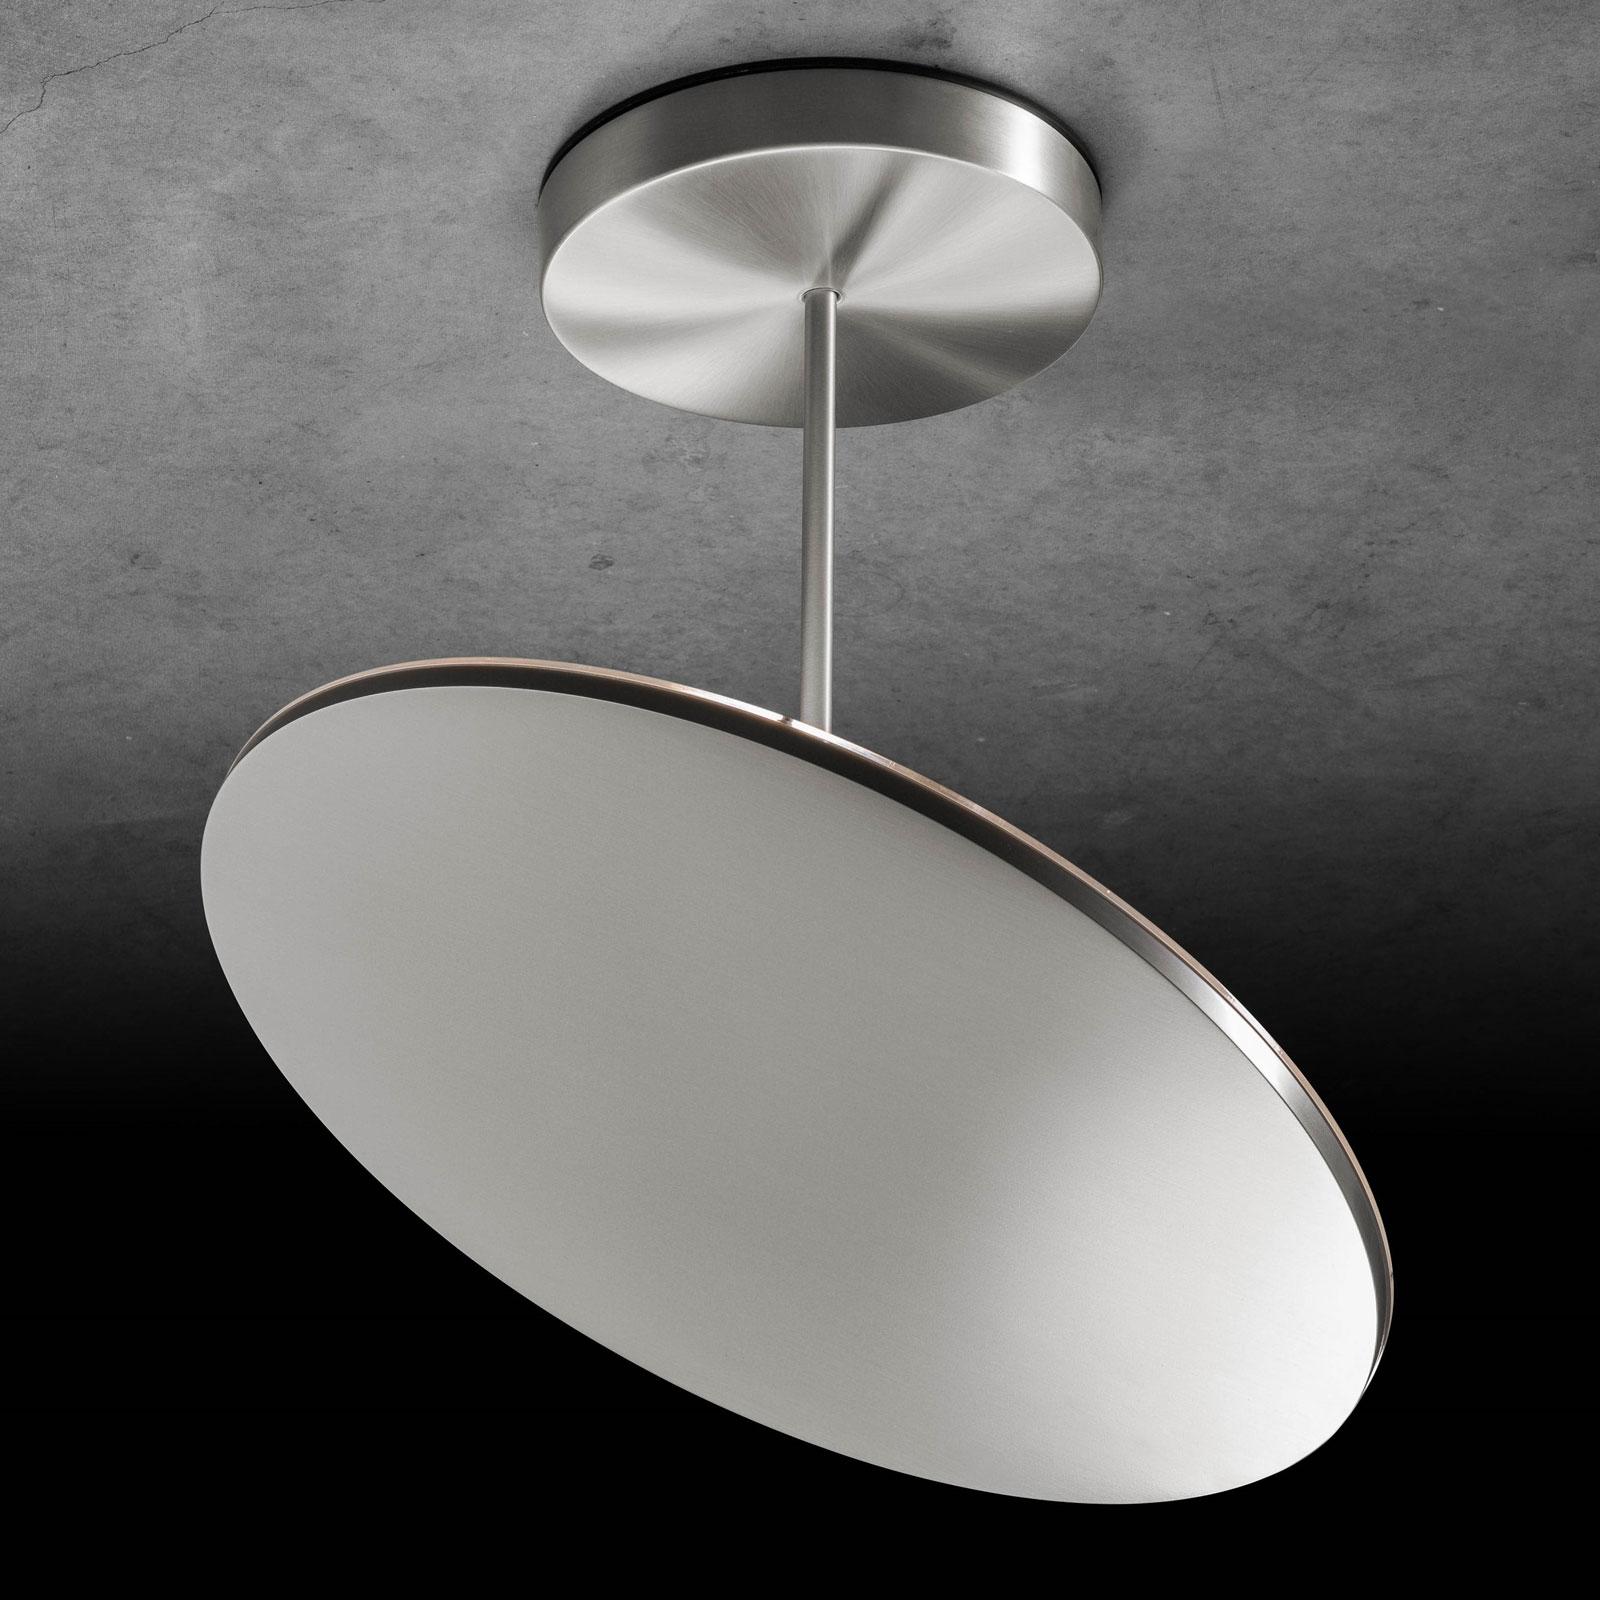 Holtkötter Plano XL LED-Deckenlampe alu matt